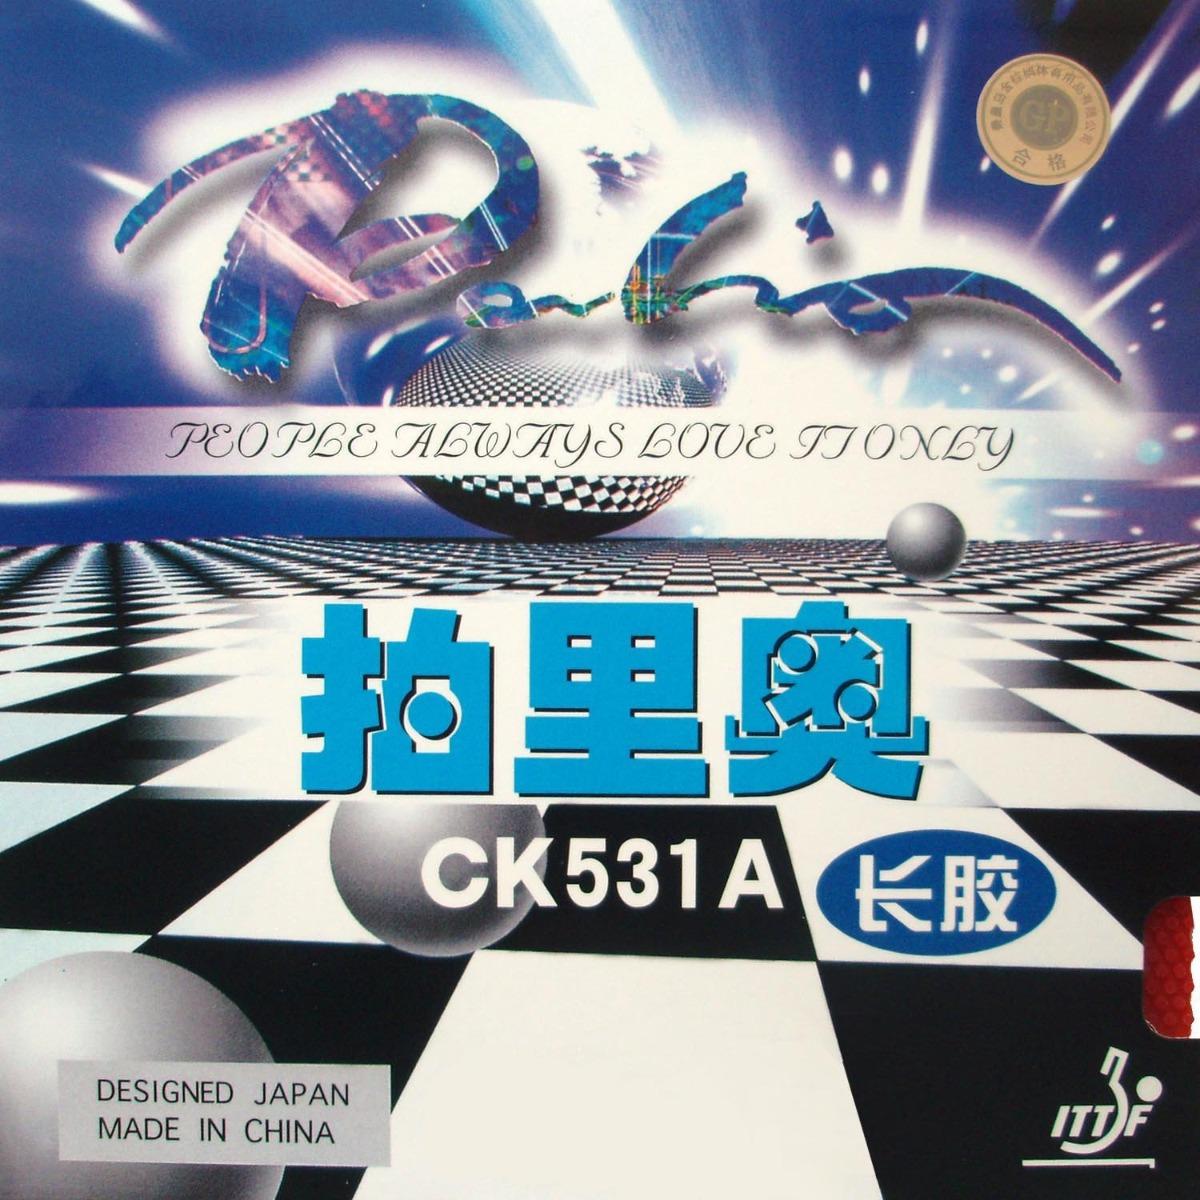 Palio CK531A